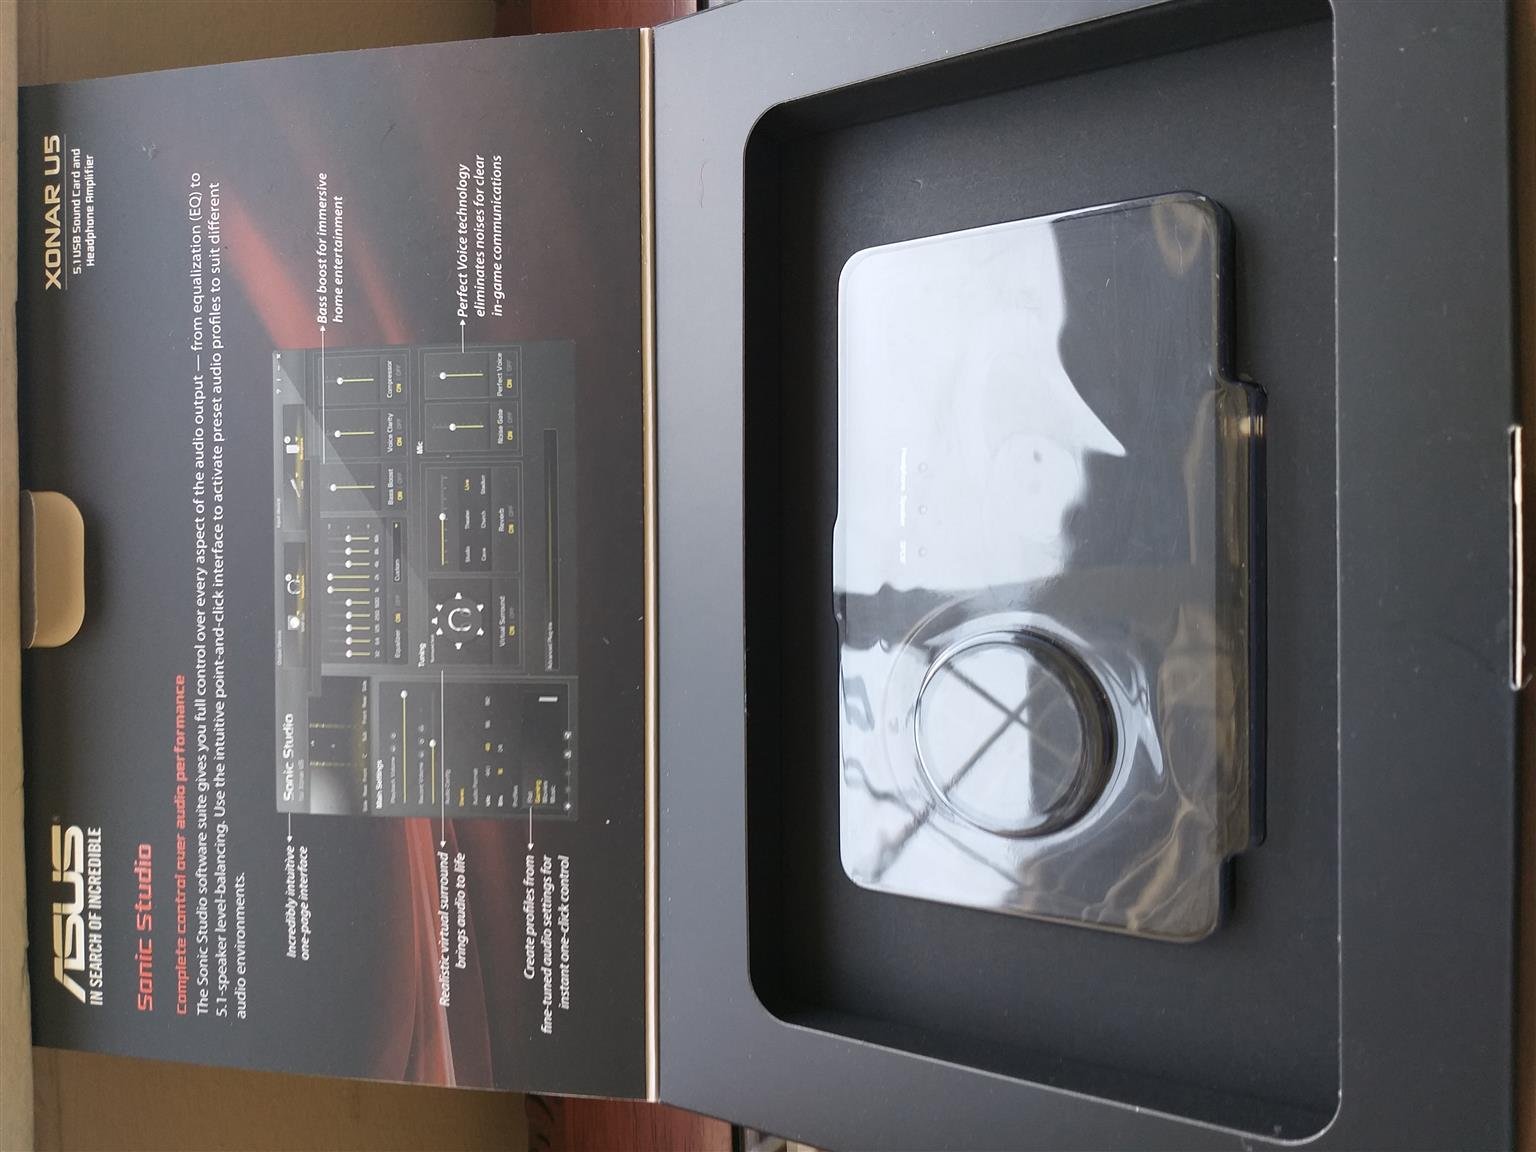 Asus XONAR U5 5.1 Channel USB Sound Card and Headphone Amplifier